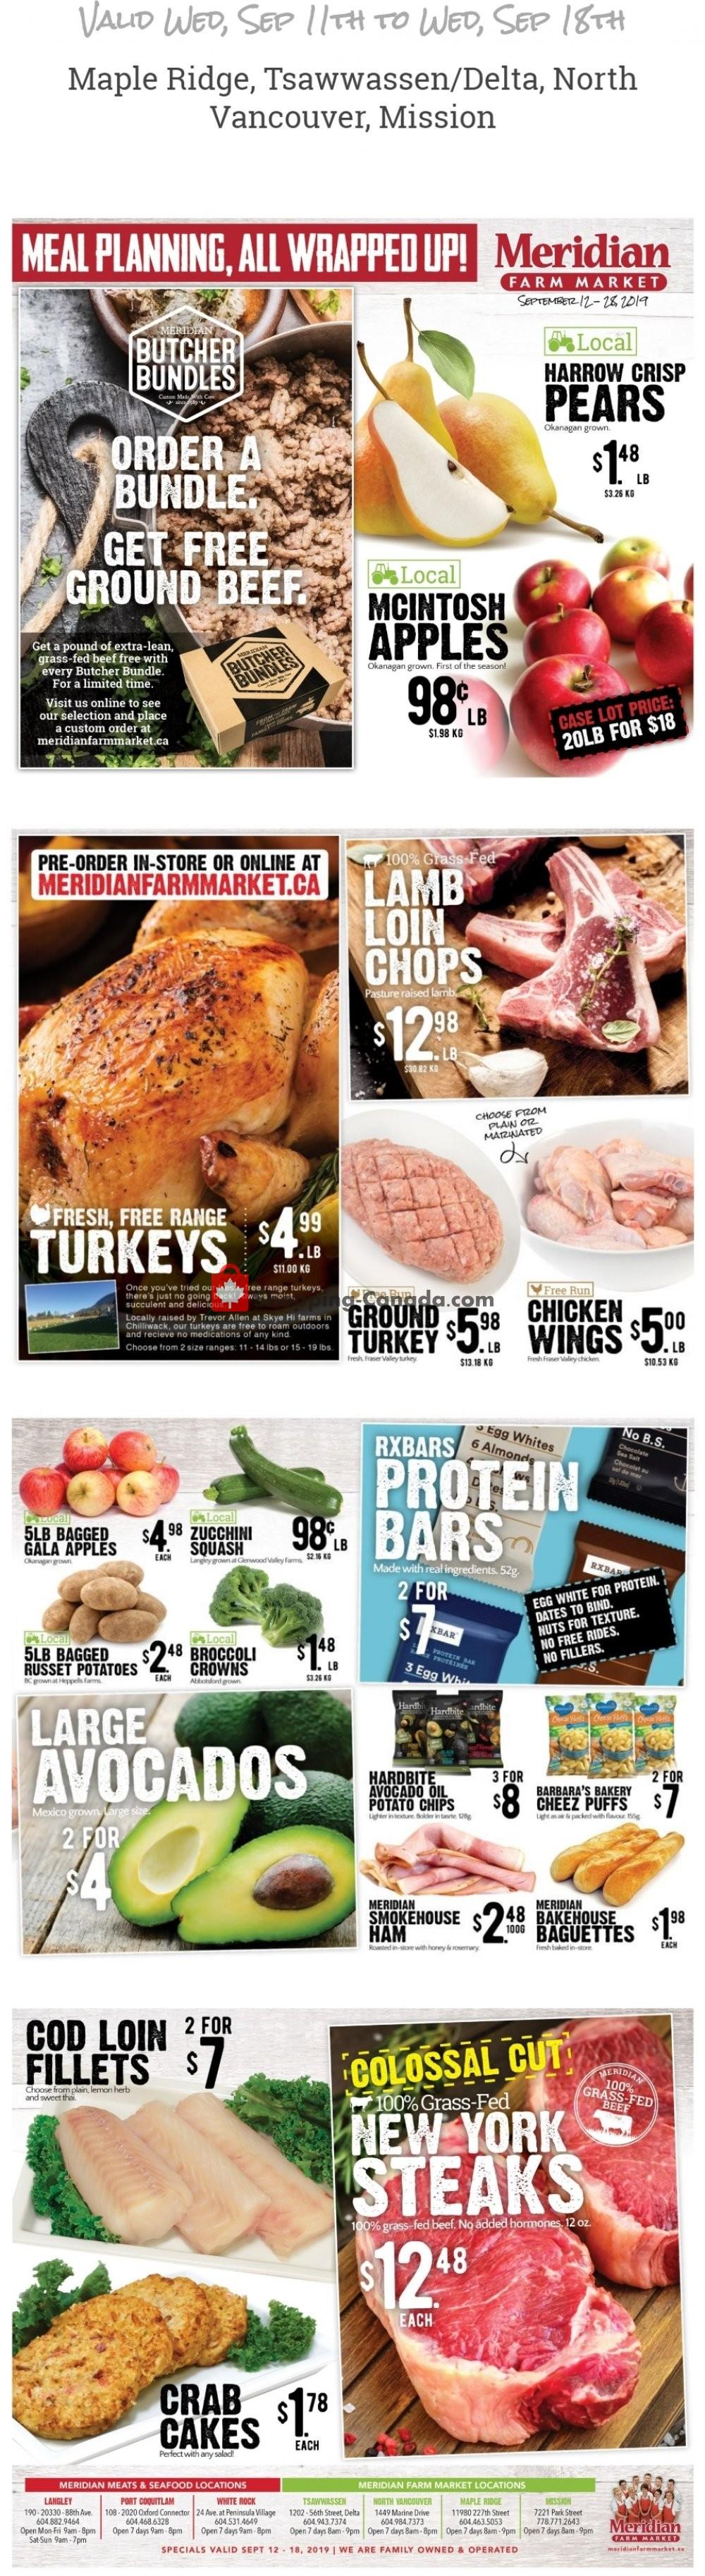 Flyer Meridian Meats & Meridian Farm Market Canada - from Thursday September 12, 2019 to Wednesday September 18, 2019